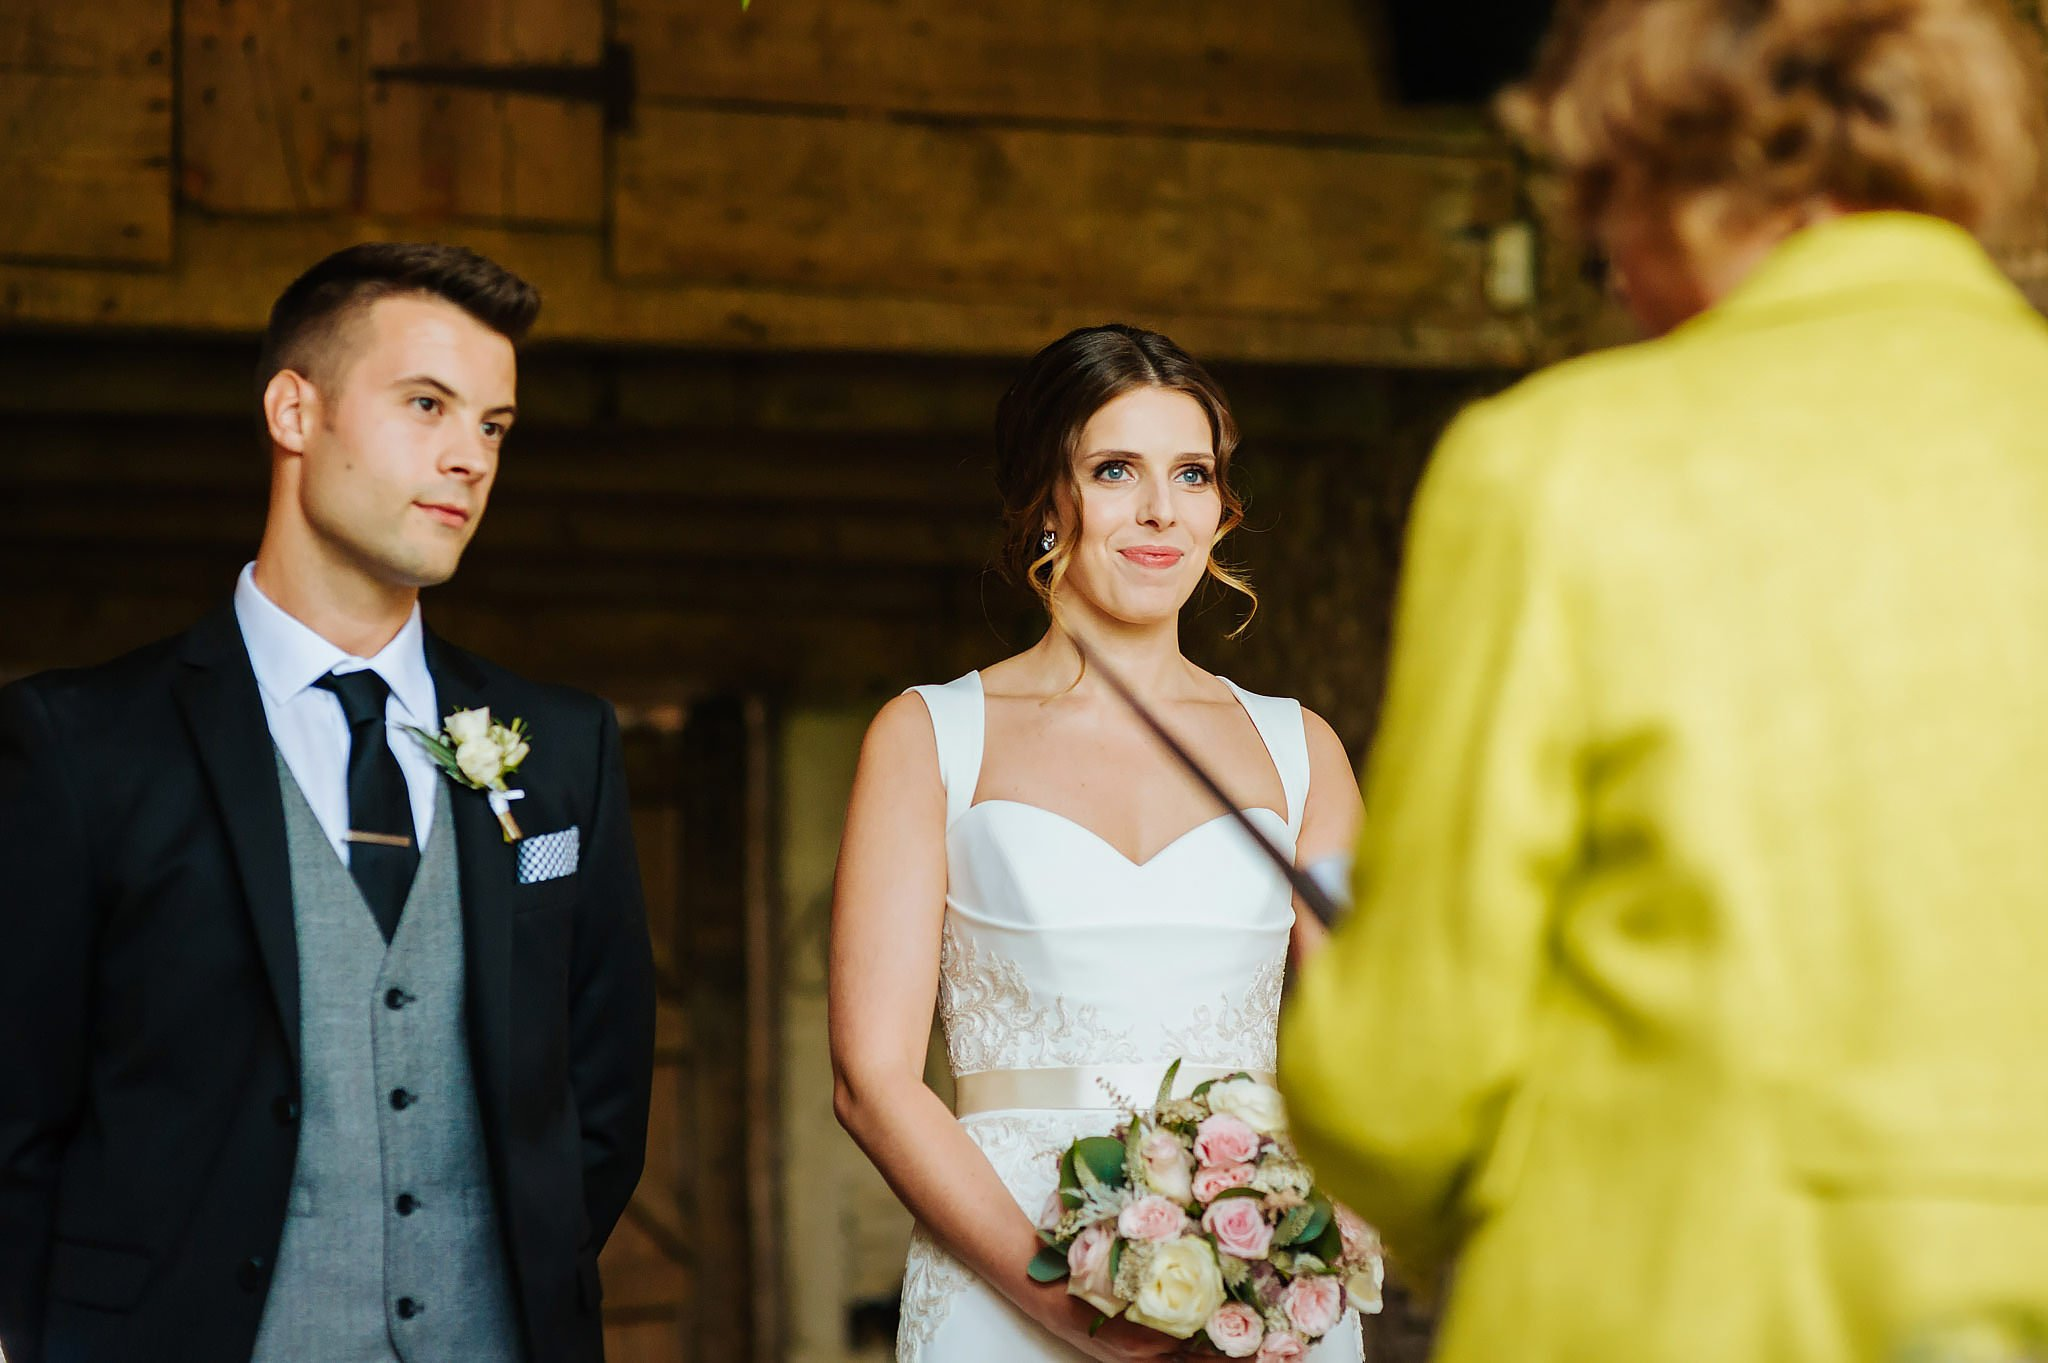 stone-barn-wedding-cotswolds (34)